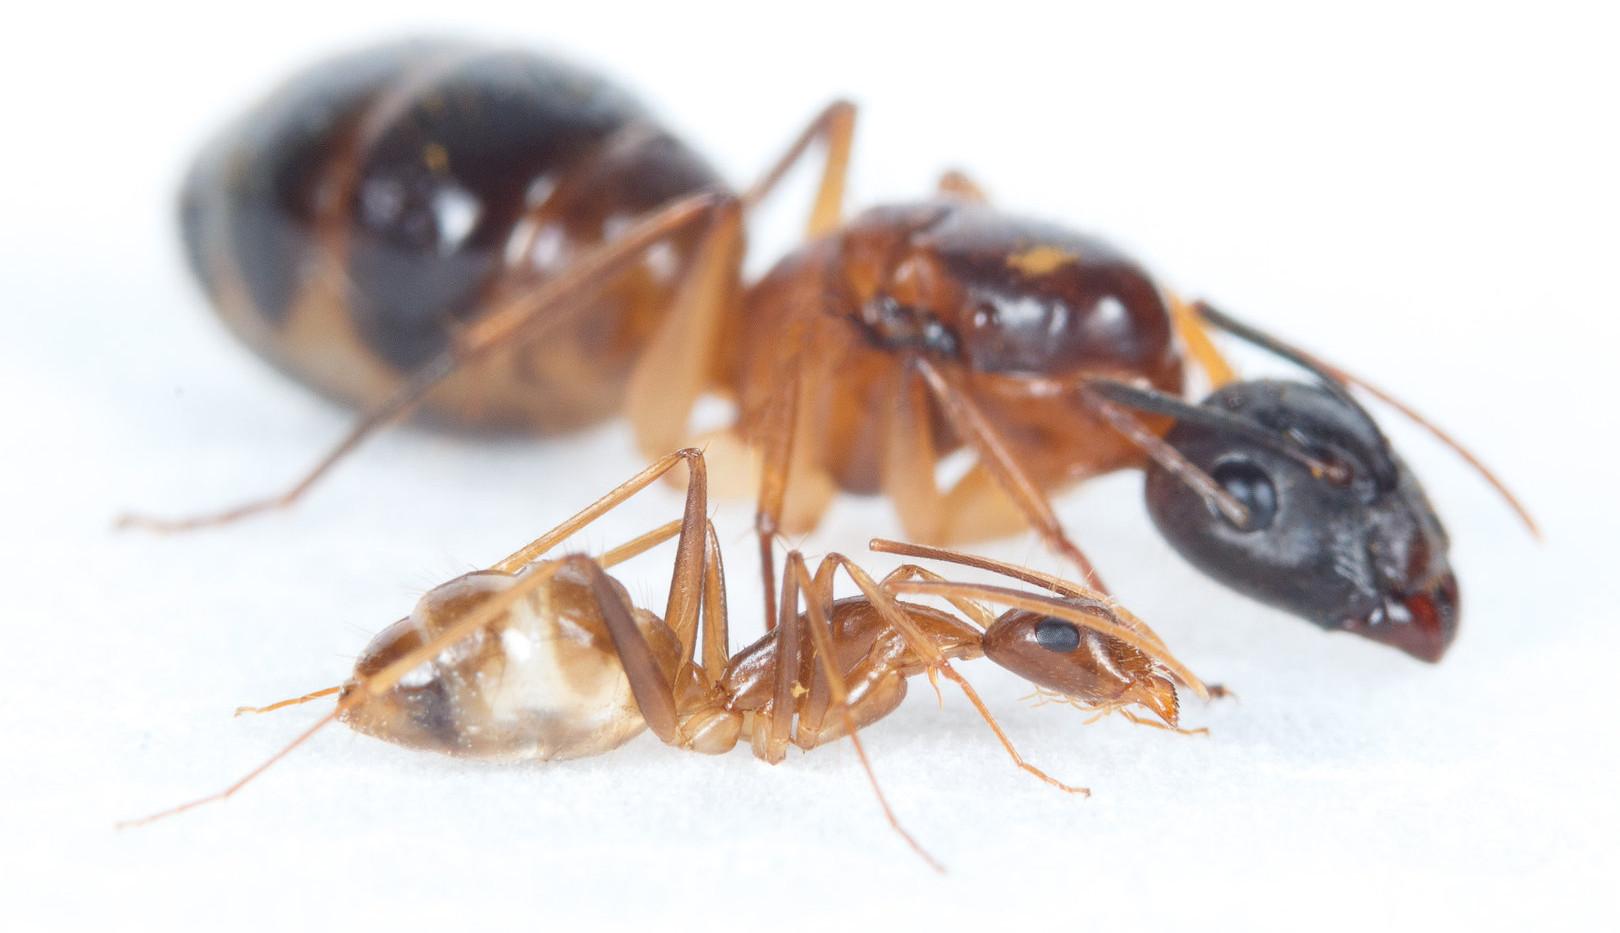 Camponotus-pseudoirritans_kopen.jpg